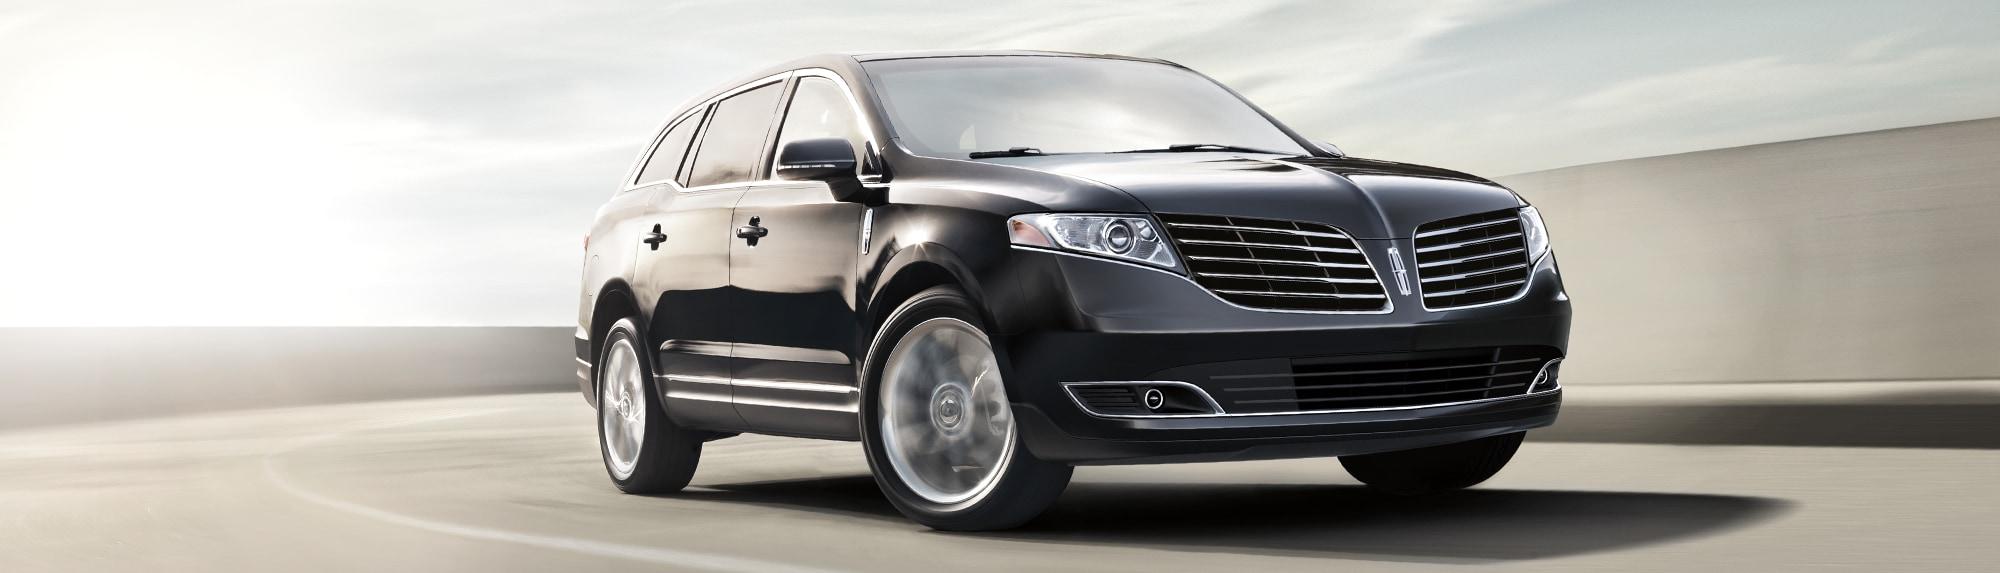 en passenger img krystal mkt stretch black car noir lincoln limousine passagers